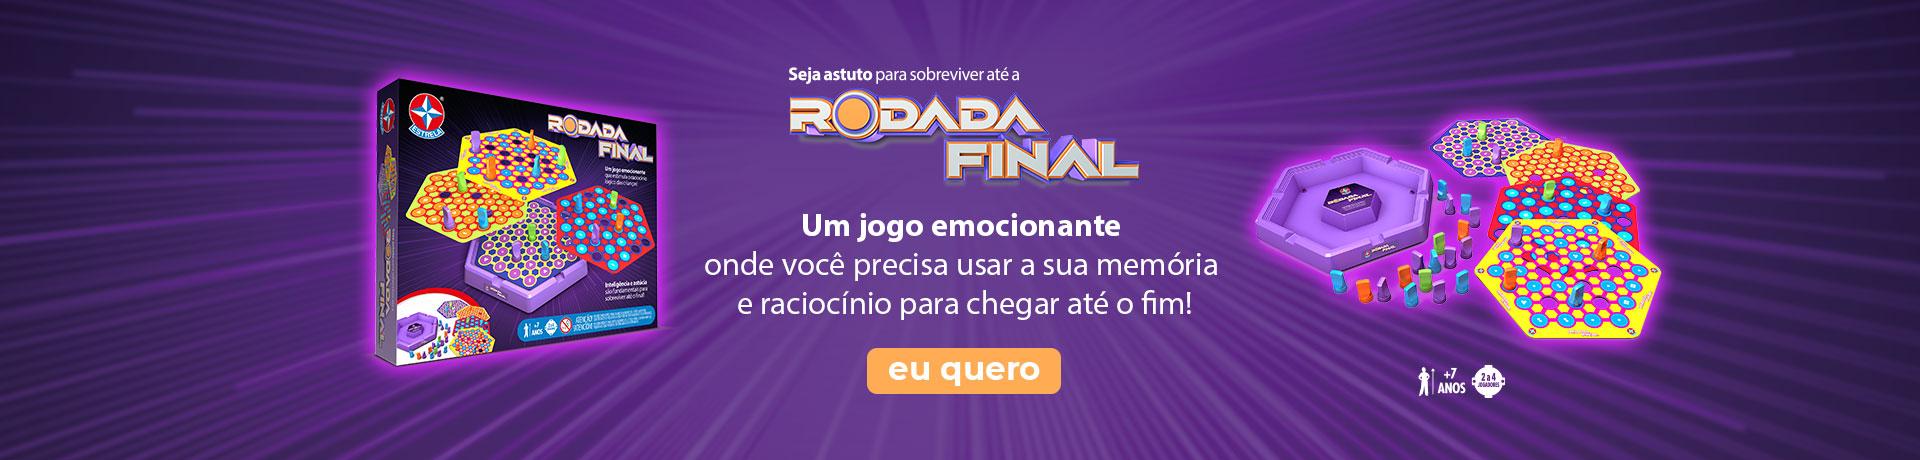 Rodada Final